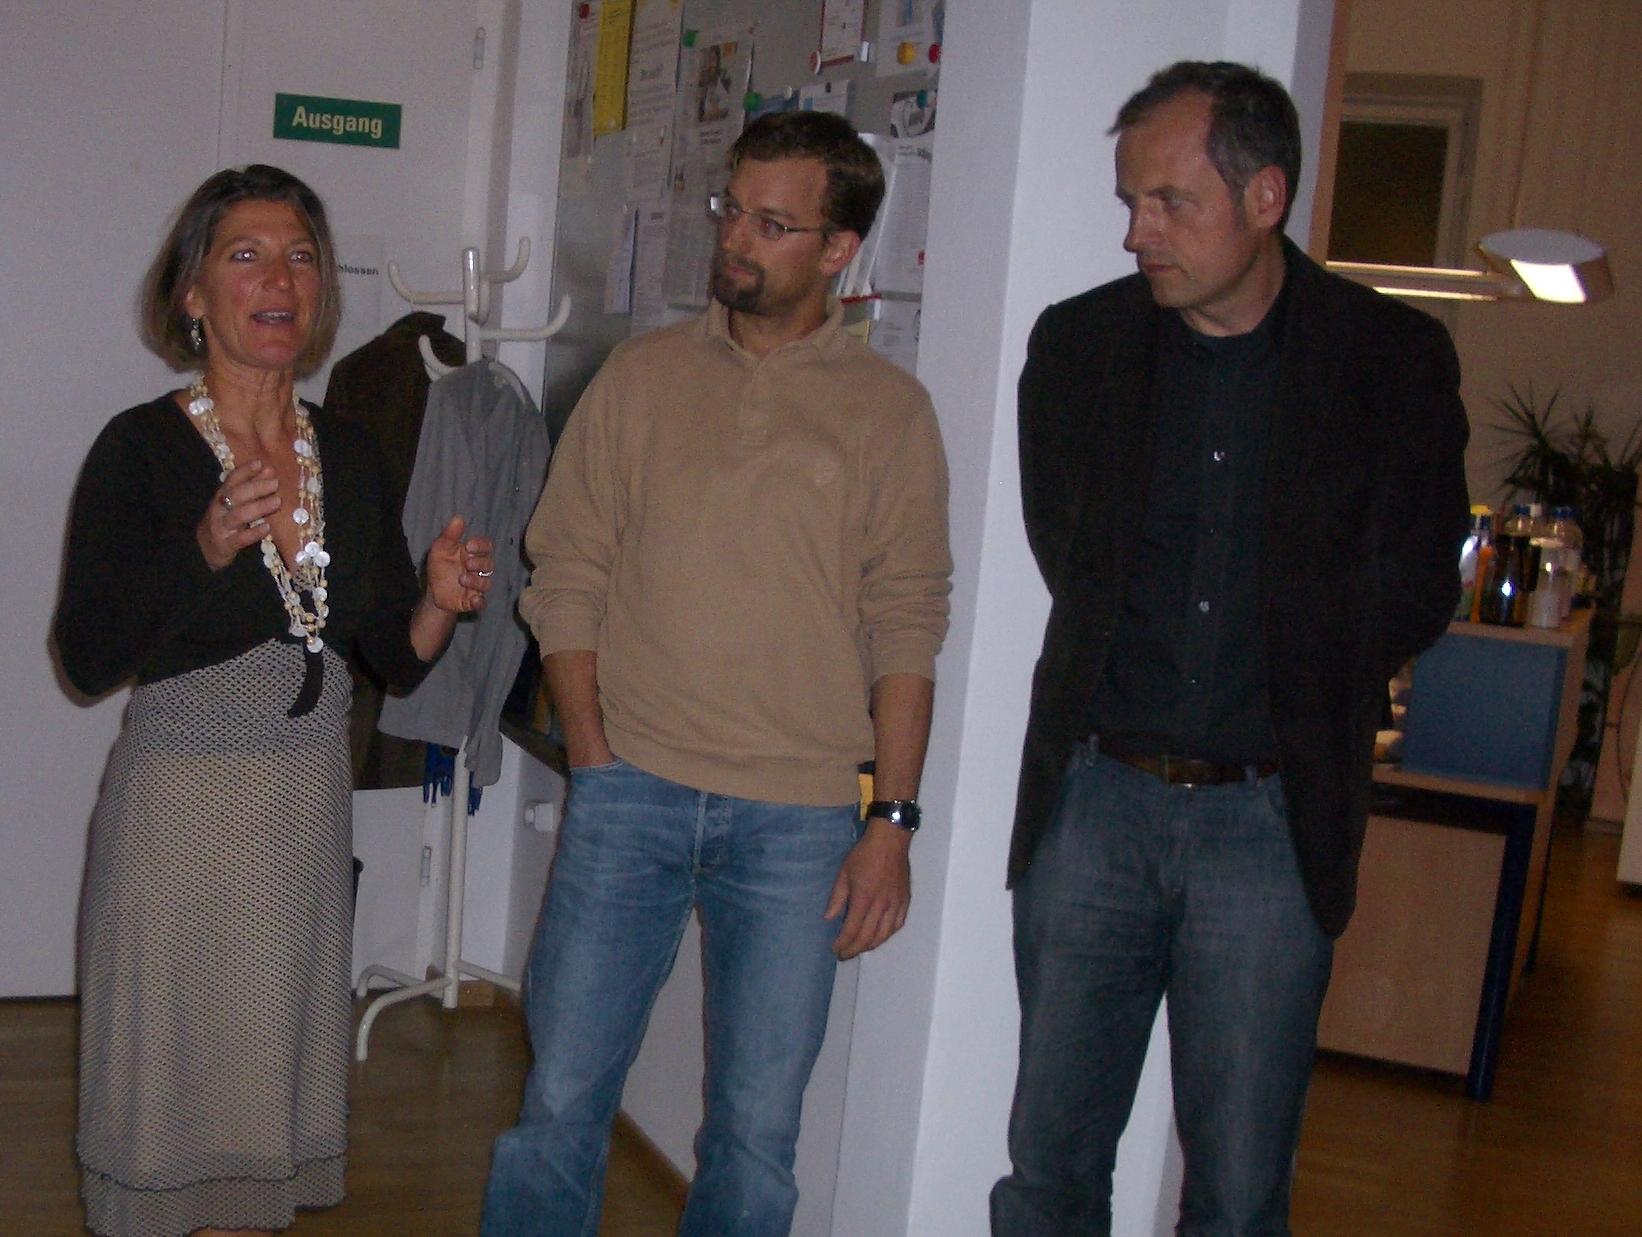 Freiwilligen-Zentrum Augsburg - Shuttletouren 2004 bis 2009 - Foto: Wolfgang F. Lightmaster